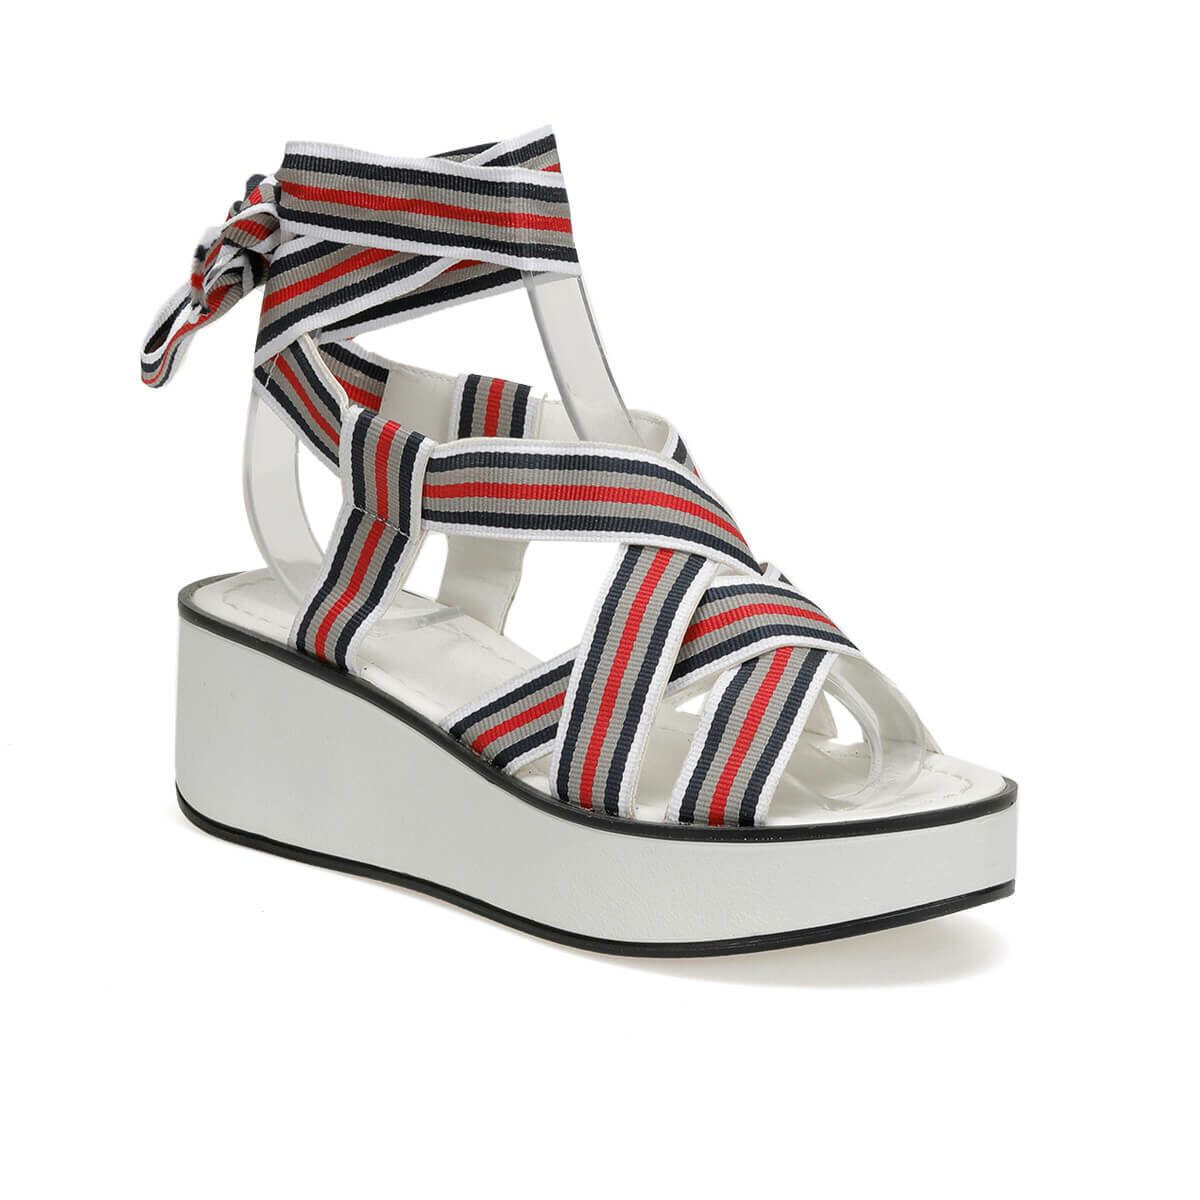 FLO White Women Sandals Summer Sandals Slip-on Wedge Ladies Sandals Comfy Wedge Female Shoes Fashion Breathable Girls Sandals Art Bella CS19136